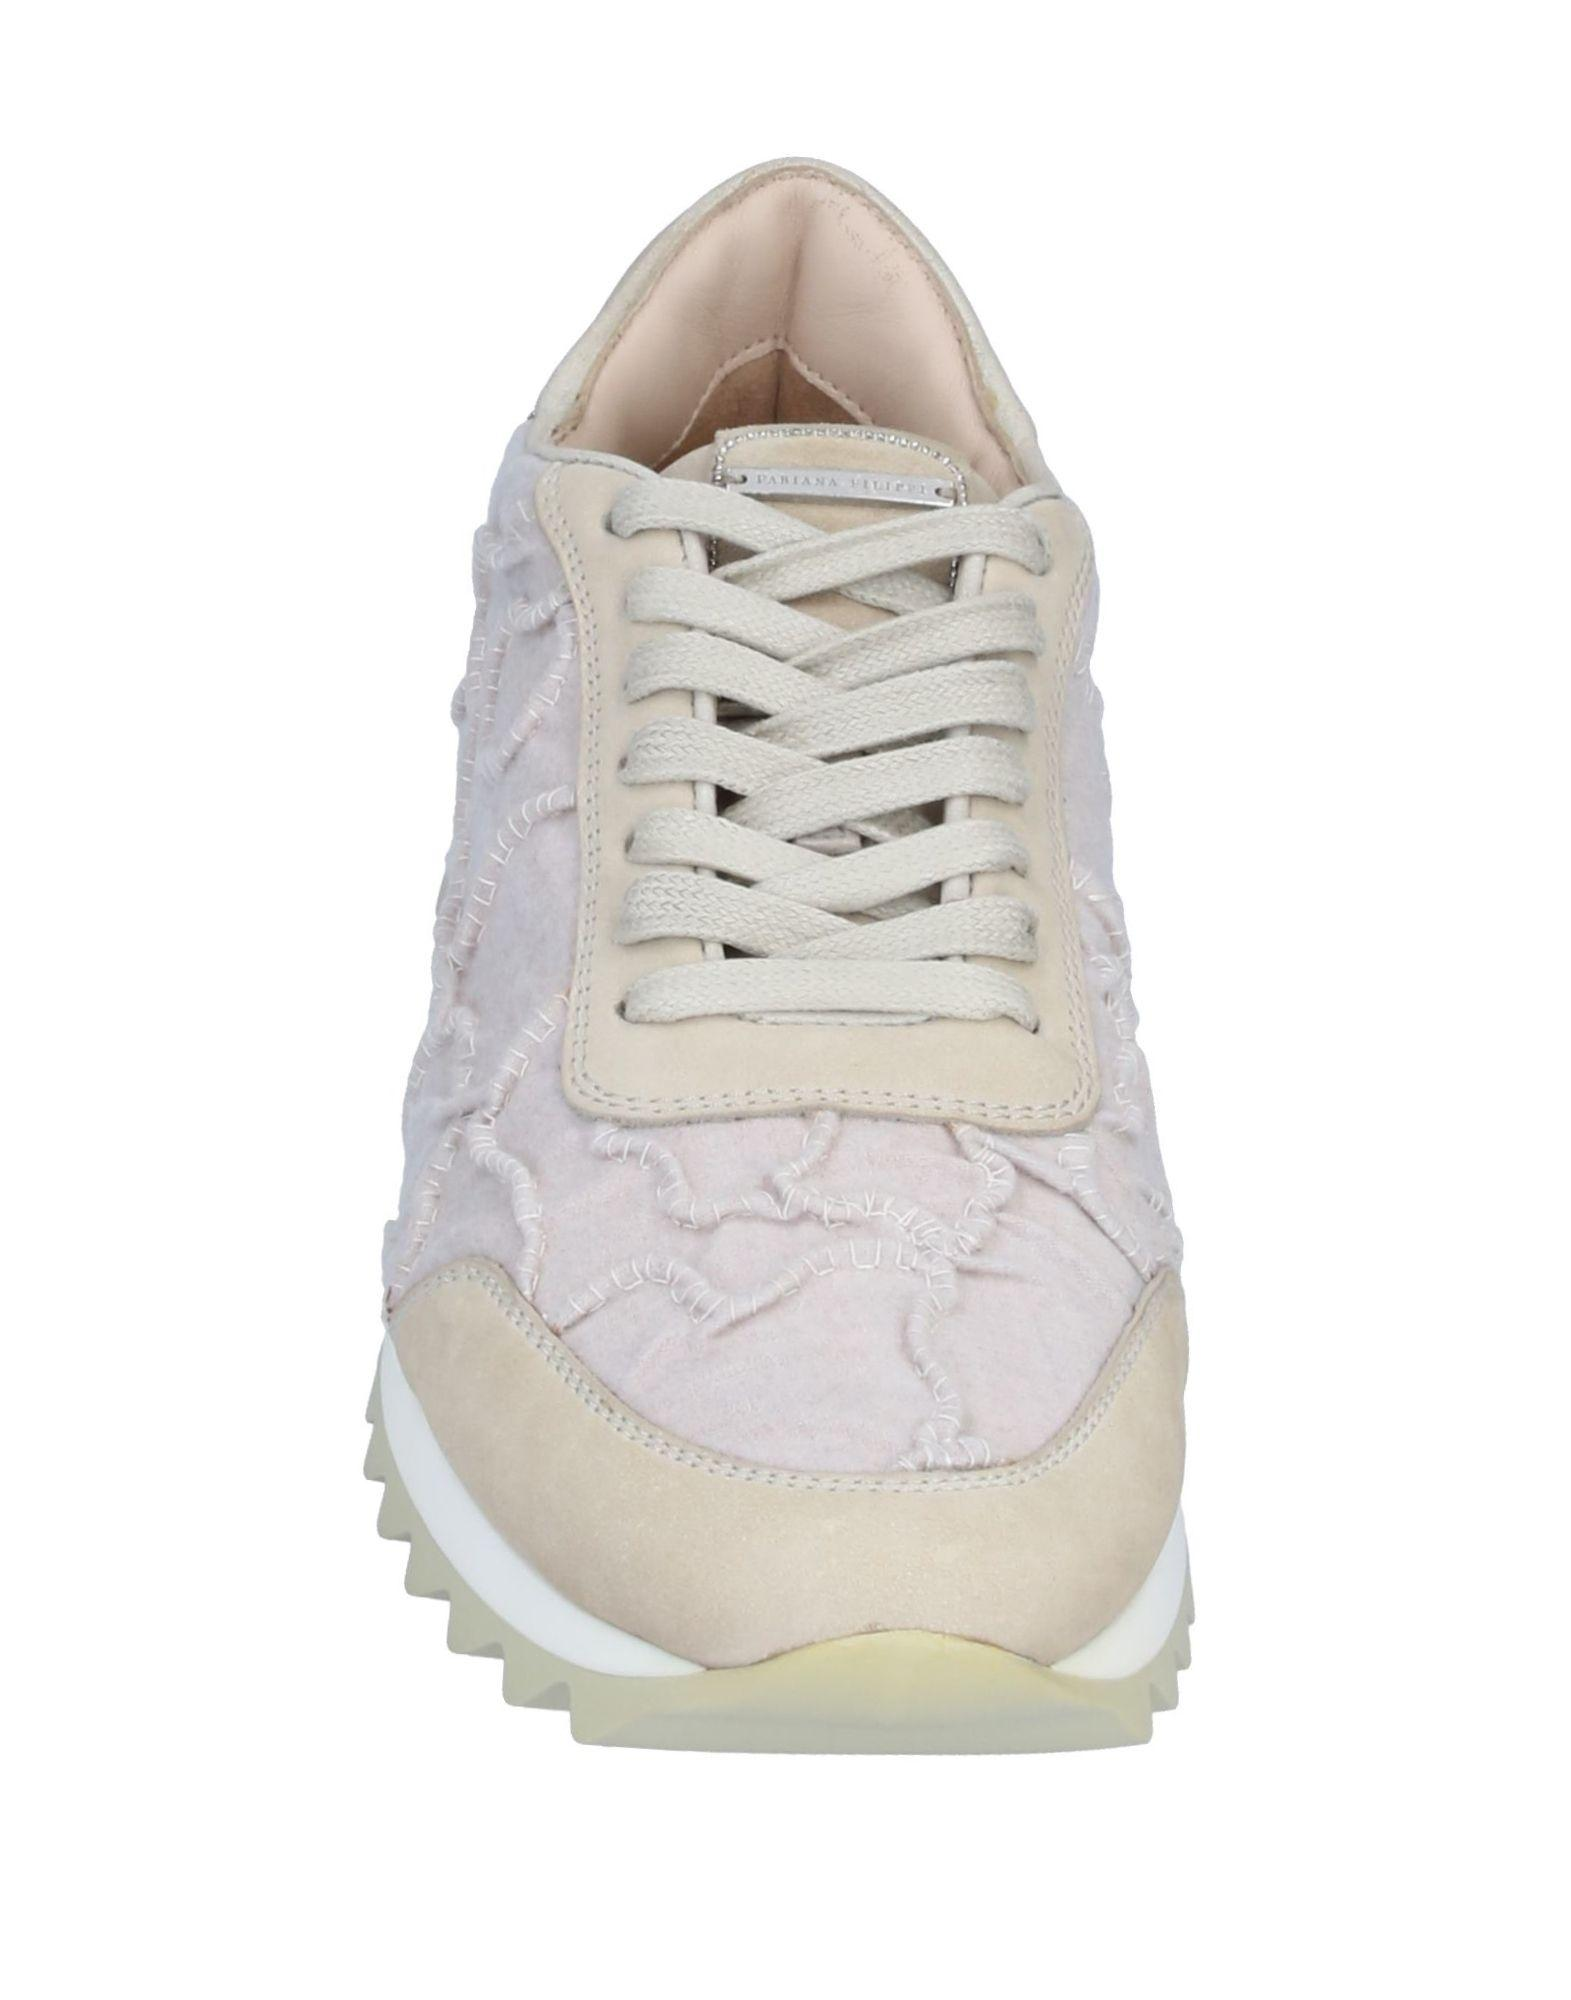 Sneakers & Tennis basses Fabiana Filippi en coloris Neutre XI61